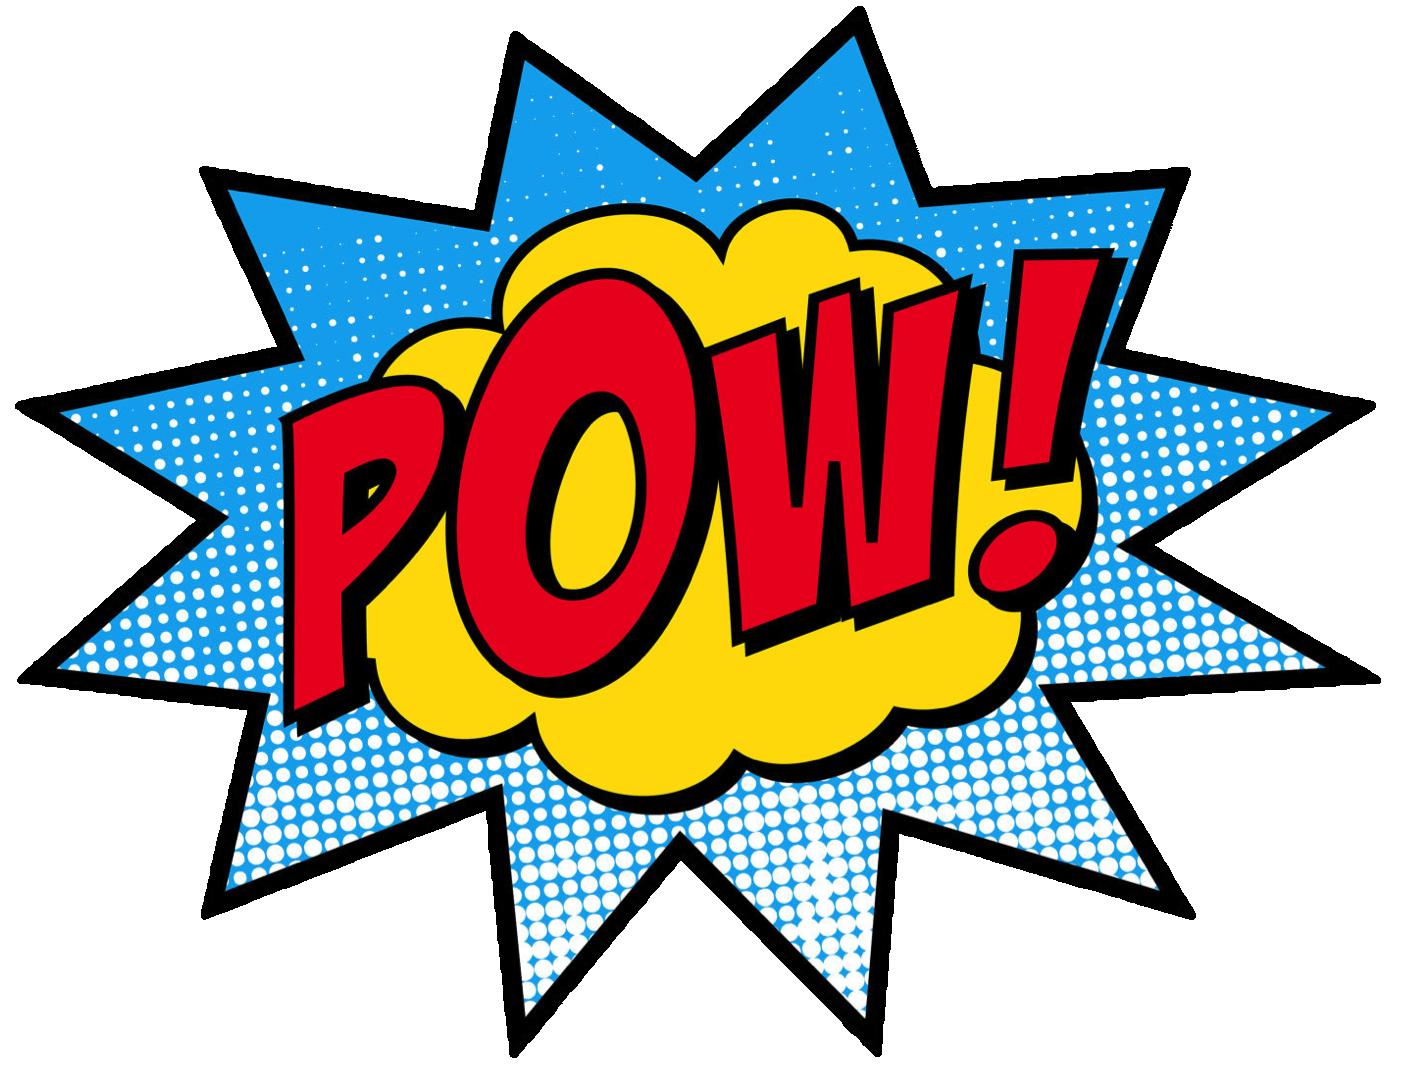 Superhero super hero words clip art free clipart images 2 - Superhero PNG